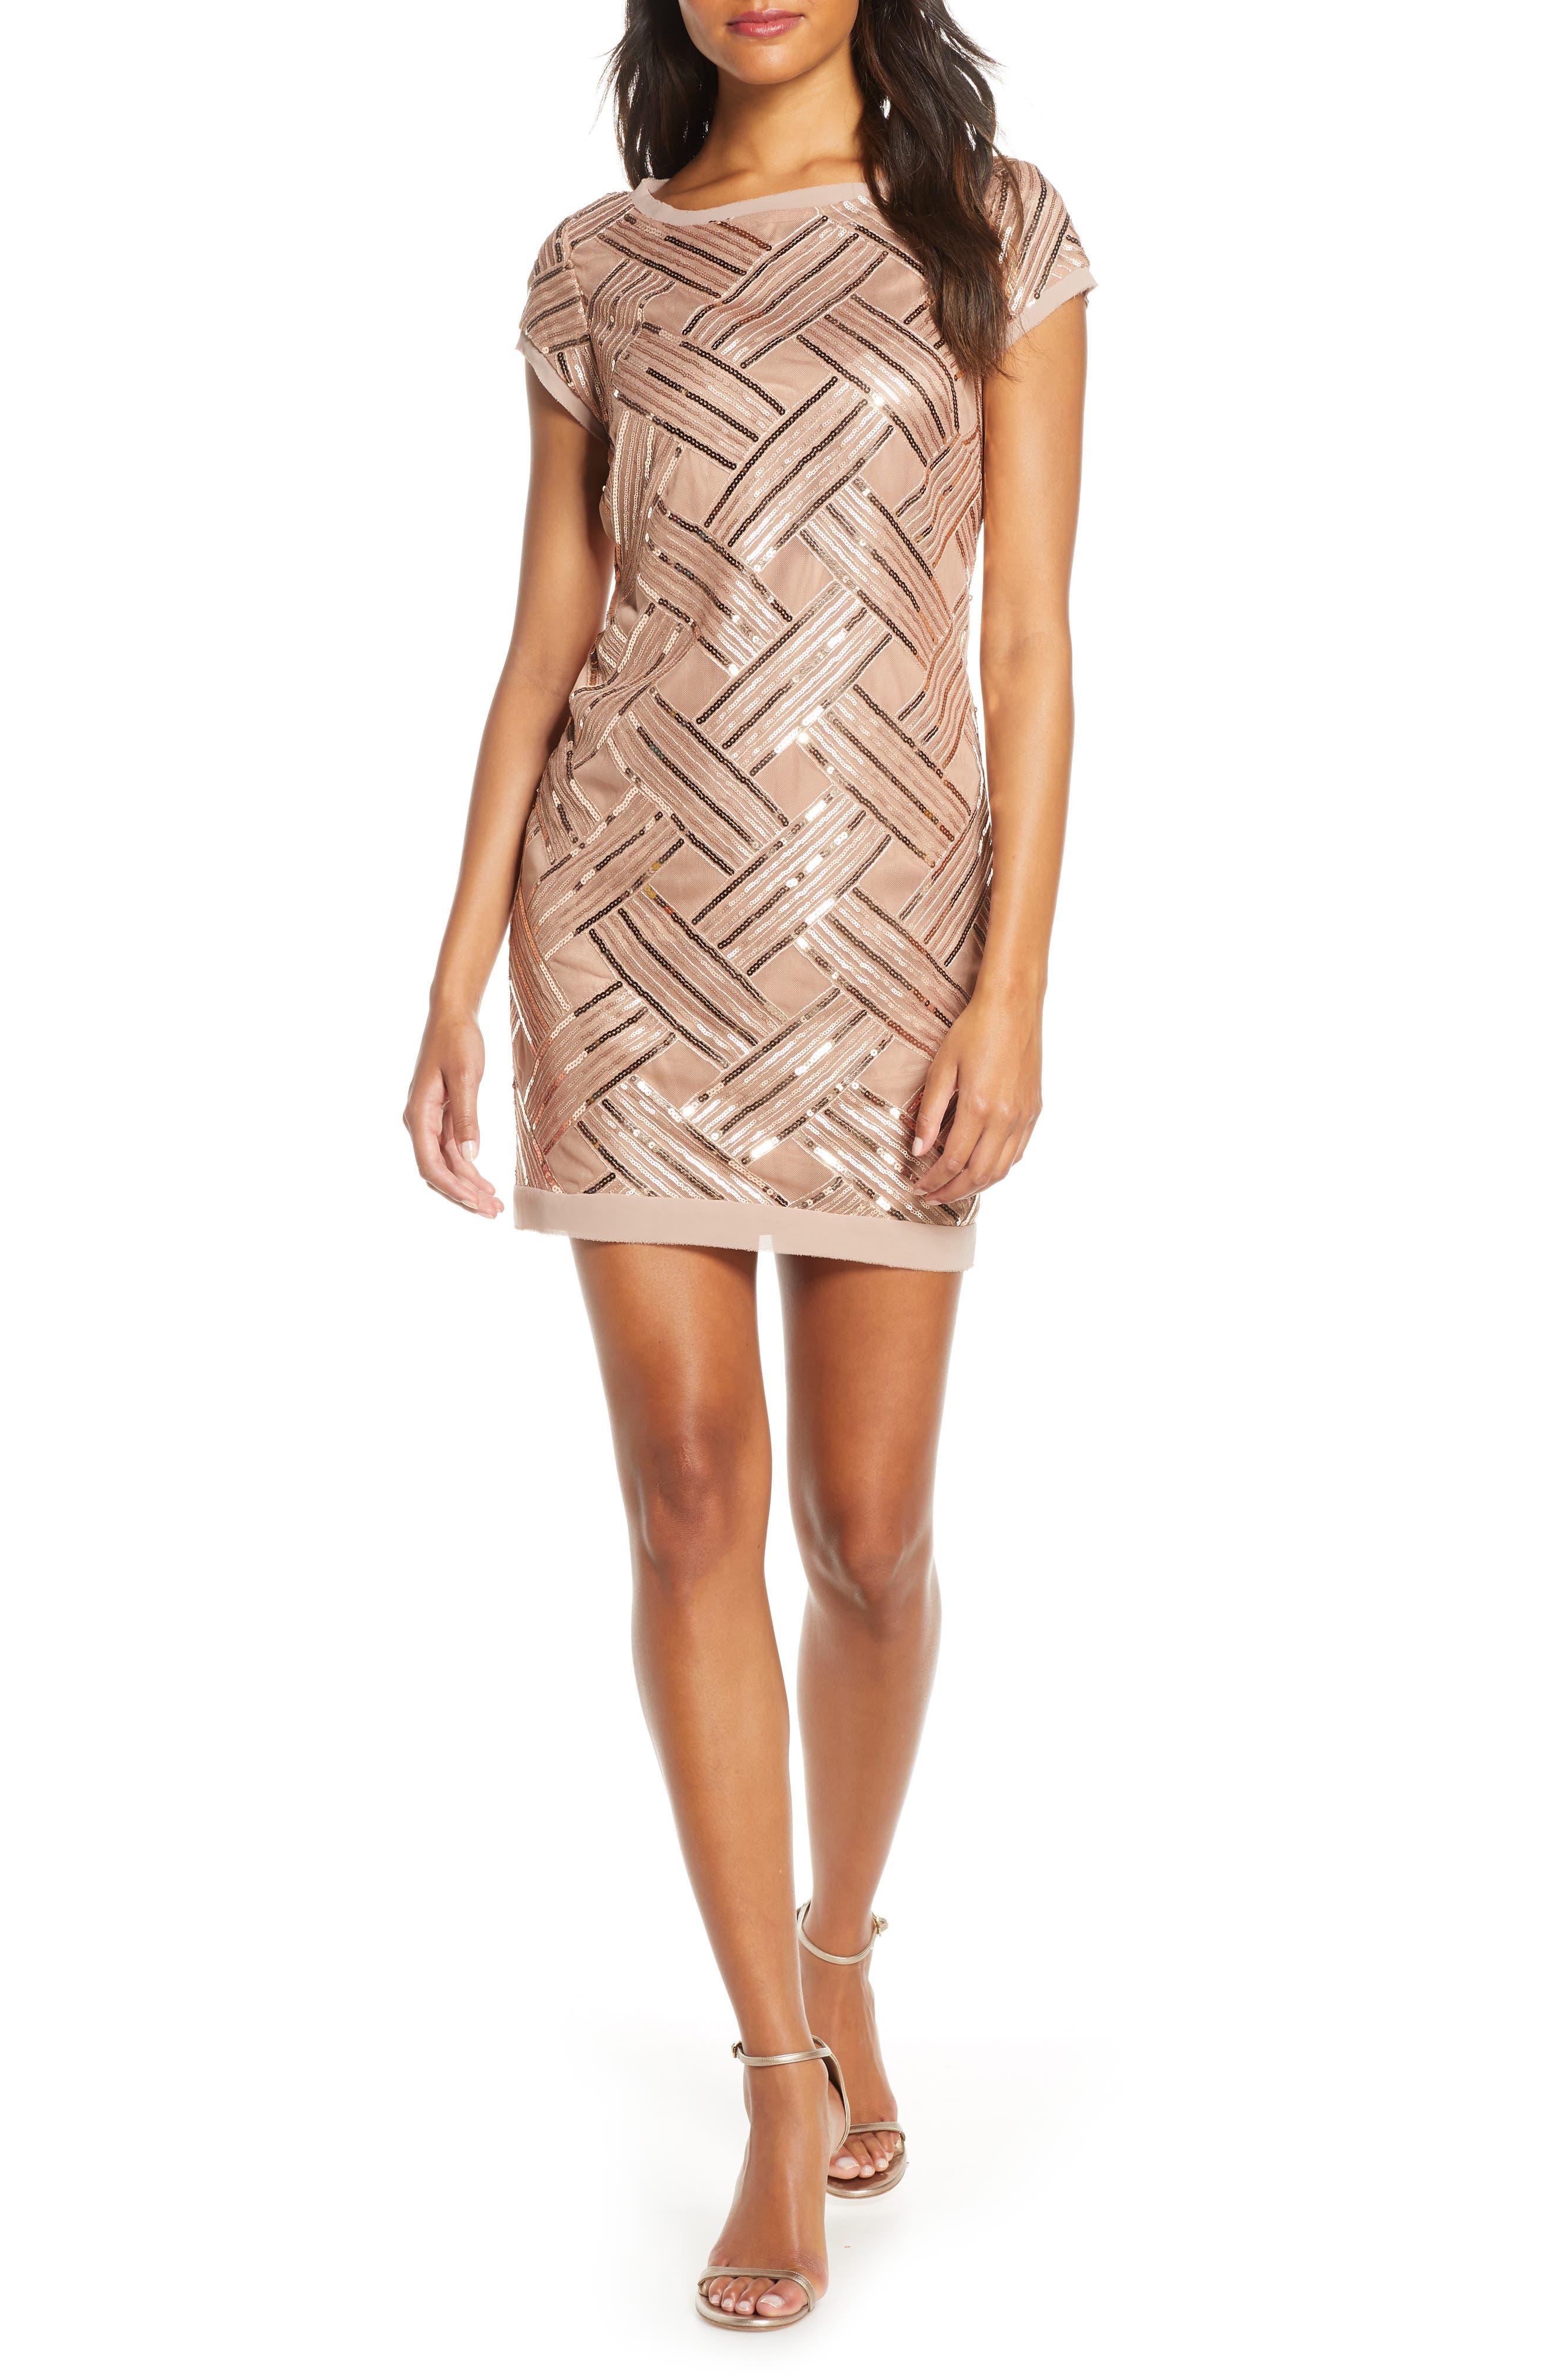 Charleston Dress: Fringe Flapper Dress Womens Eliza J Lattice Pattern Sequin Sheath Dress $138.00 AT vintagedancer.com